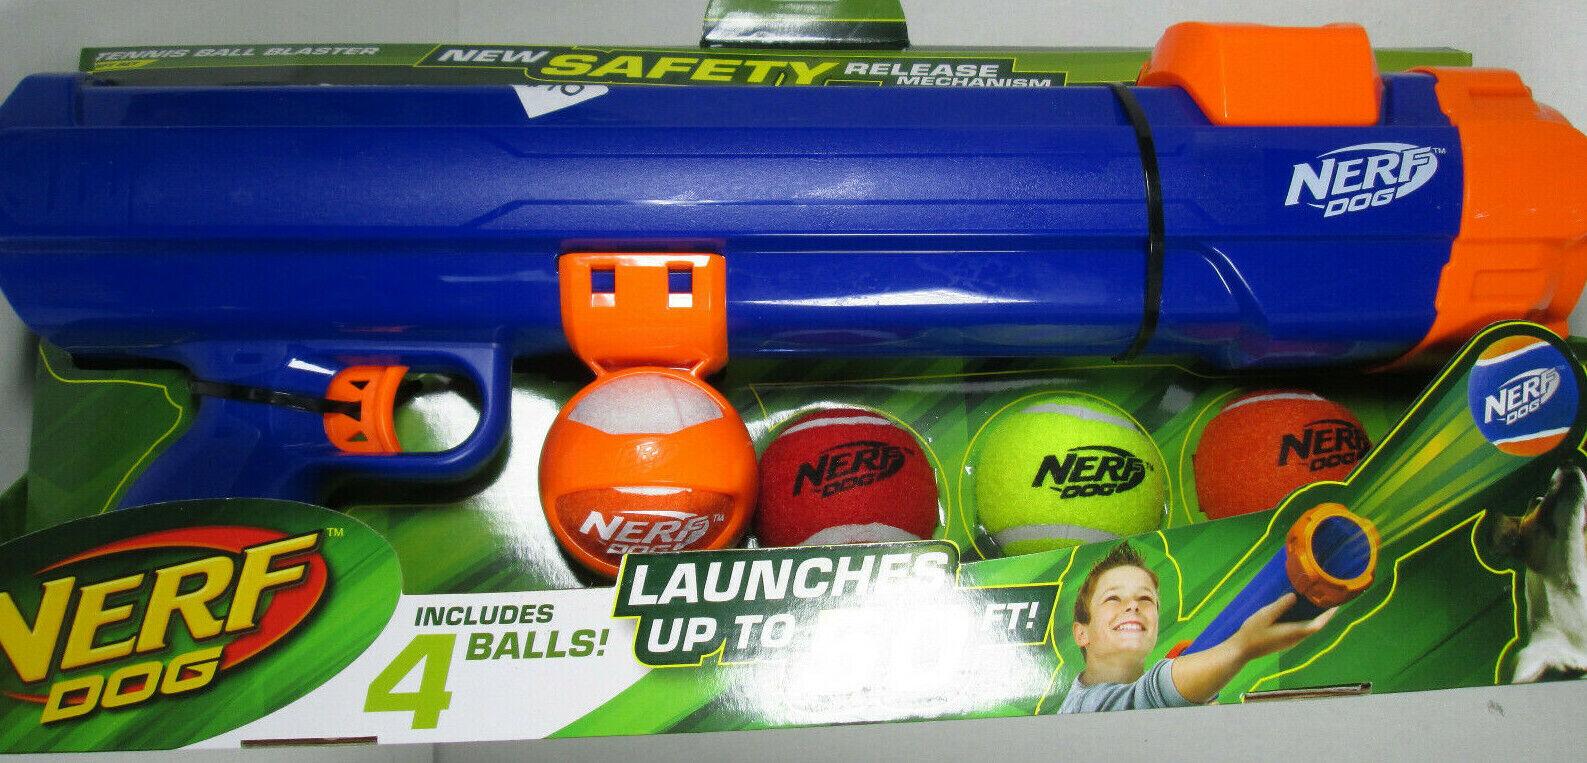 Nerf Dog Tennis Ball Gun Launcher Blaster Skyrocket 50 Feet